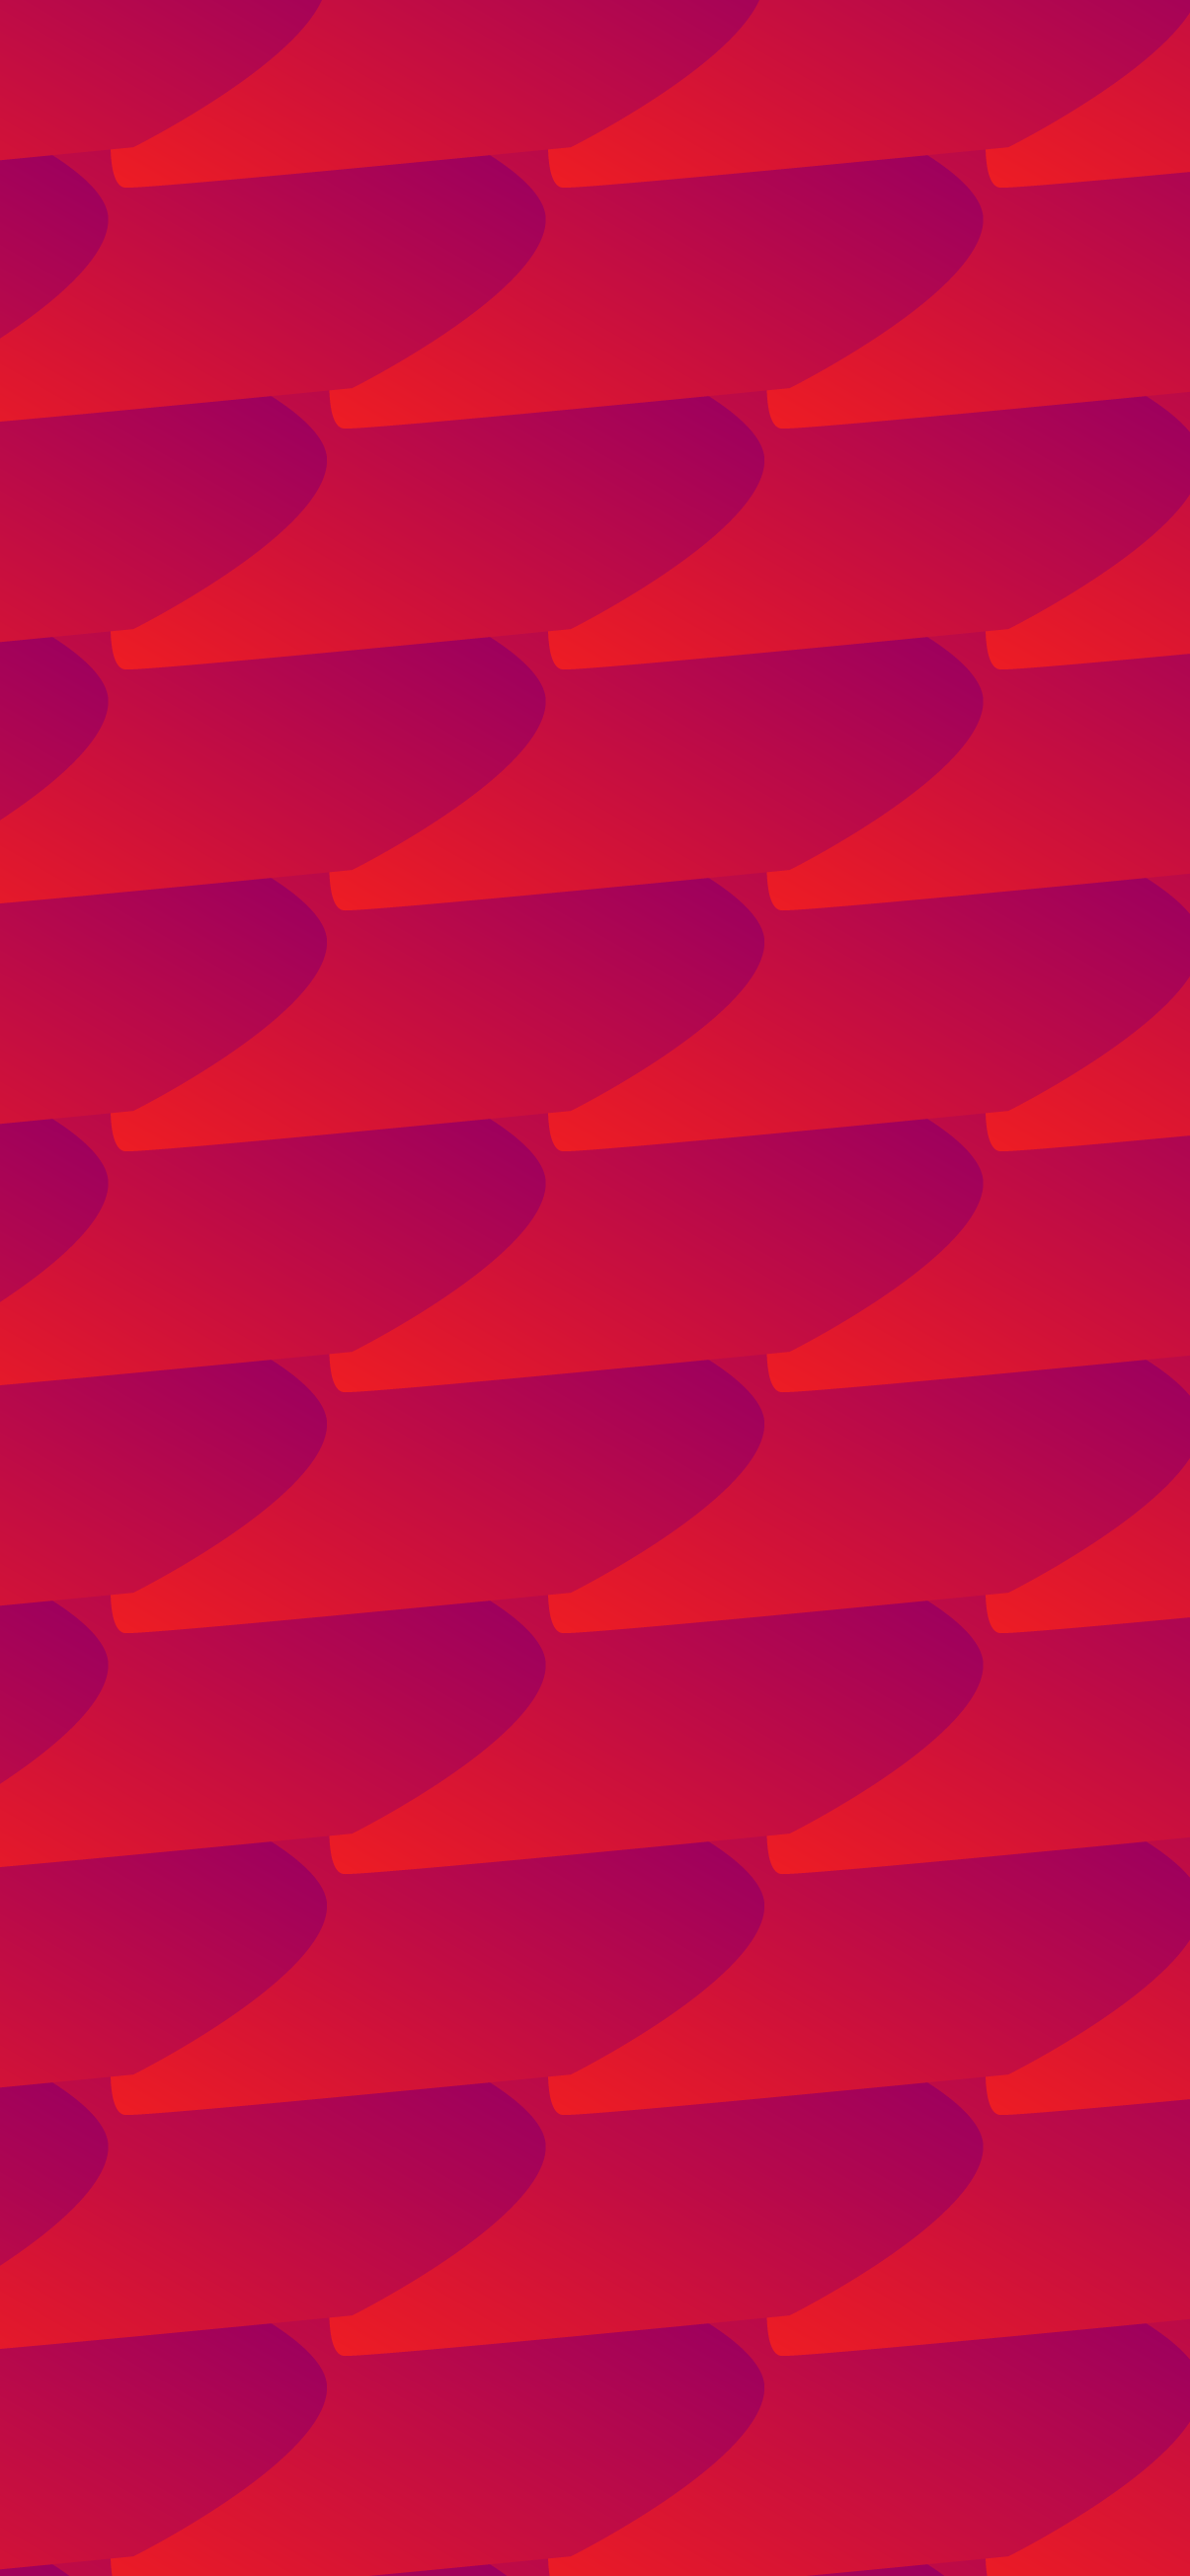 wallpaper red